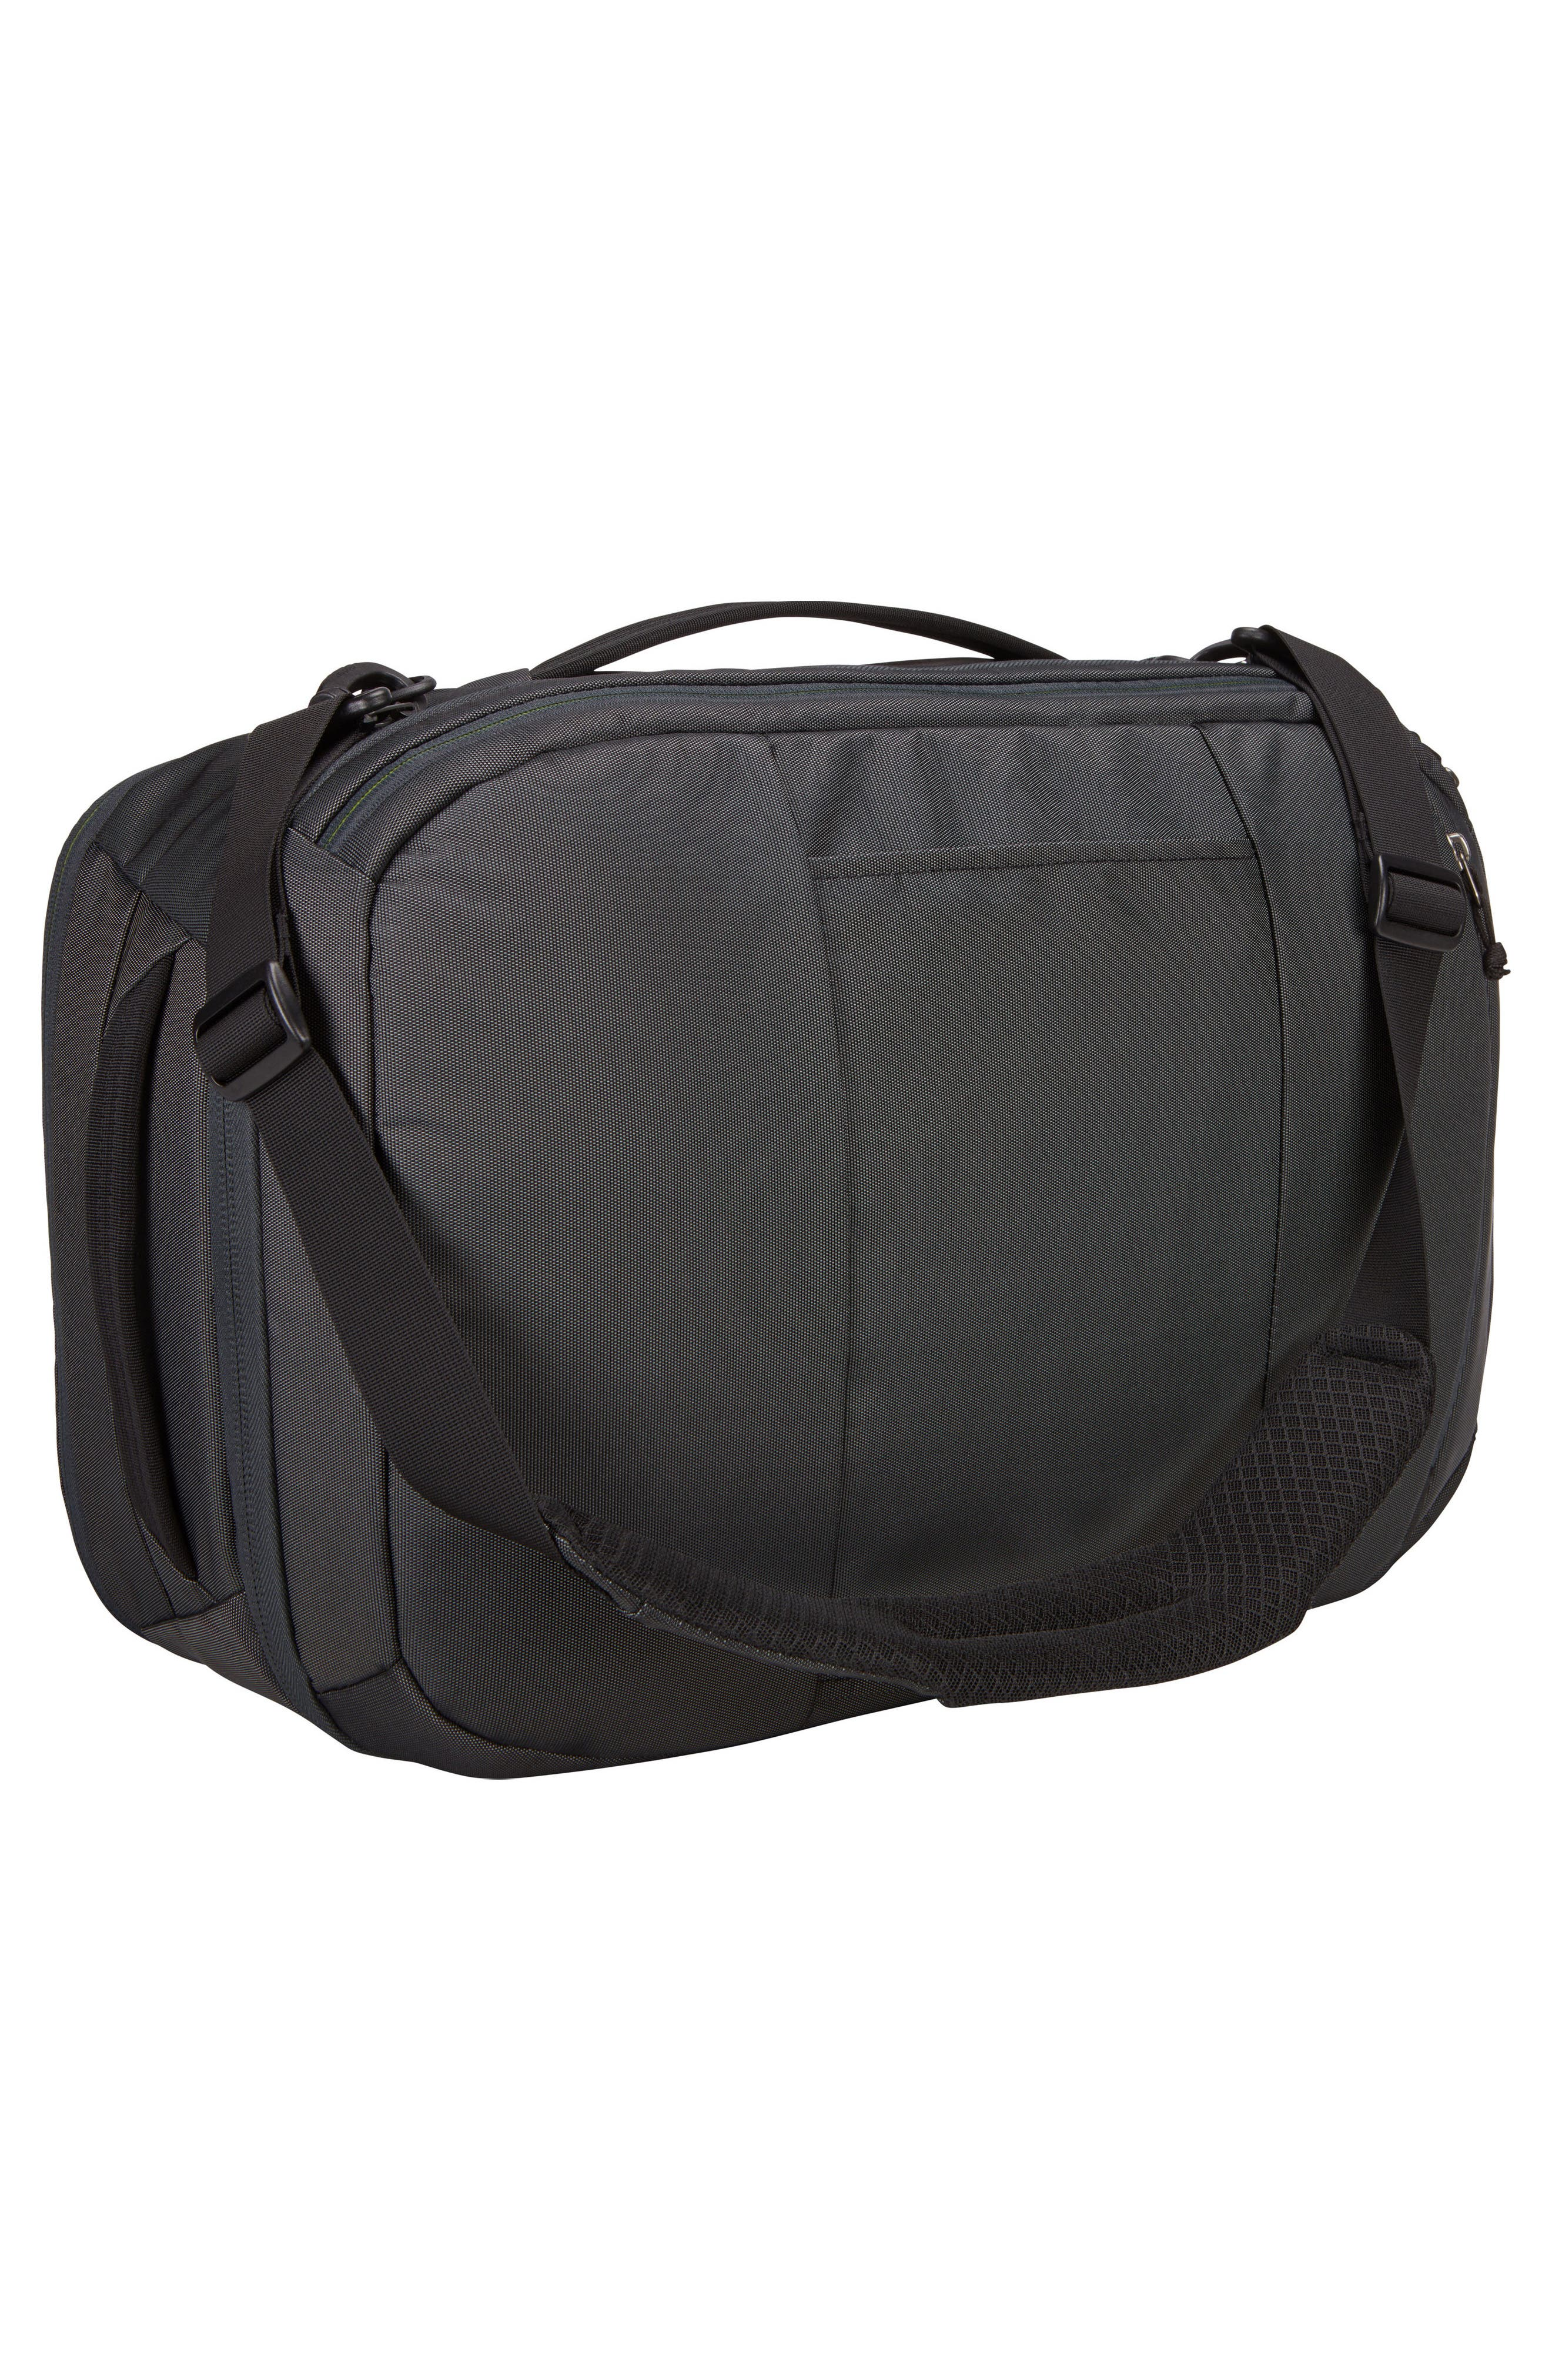 Subterra 40-Liter Convertible Duffel Bag,                             Alternate thumbnail 7, color,                             Dark Shadow